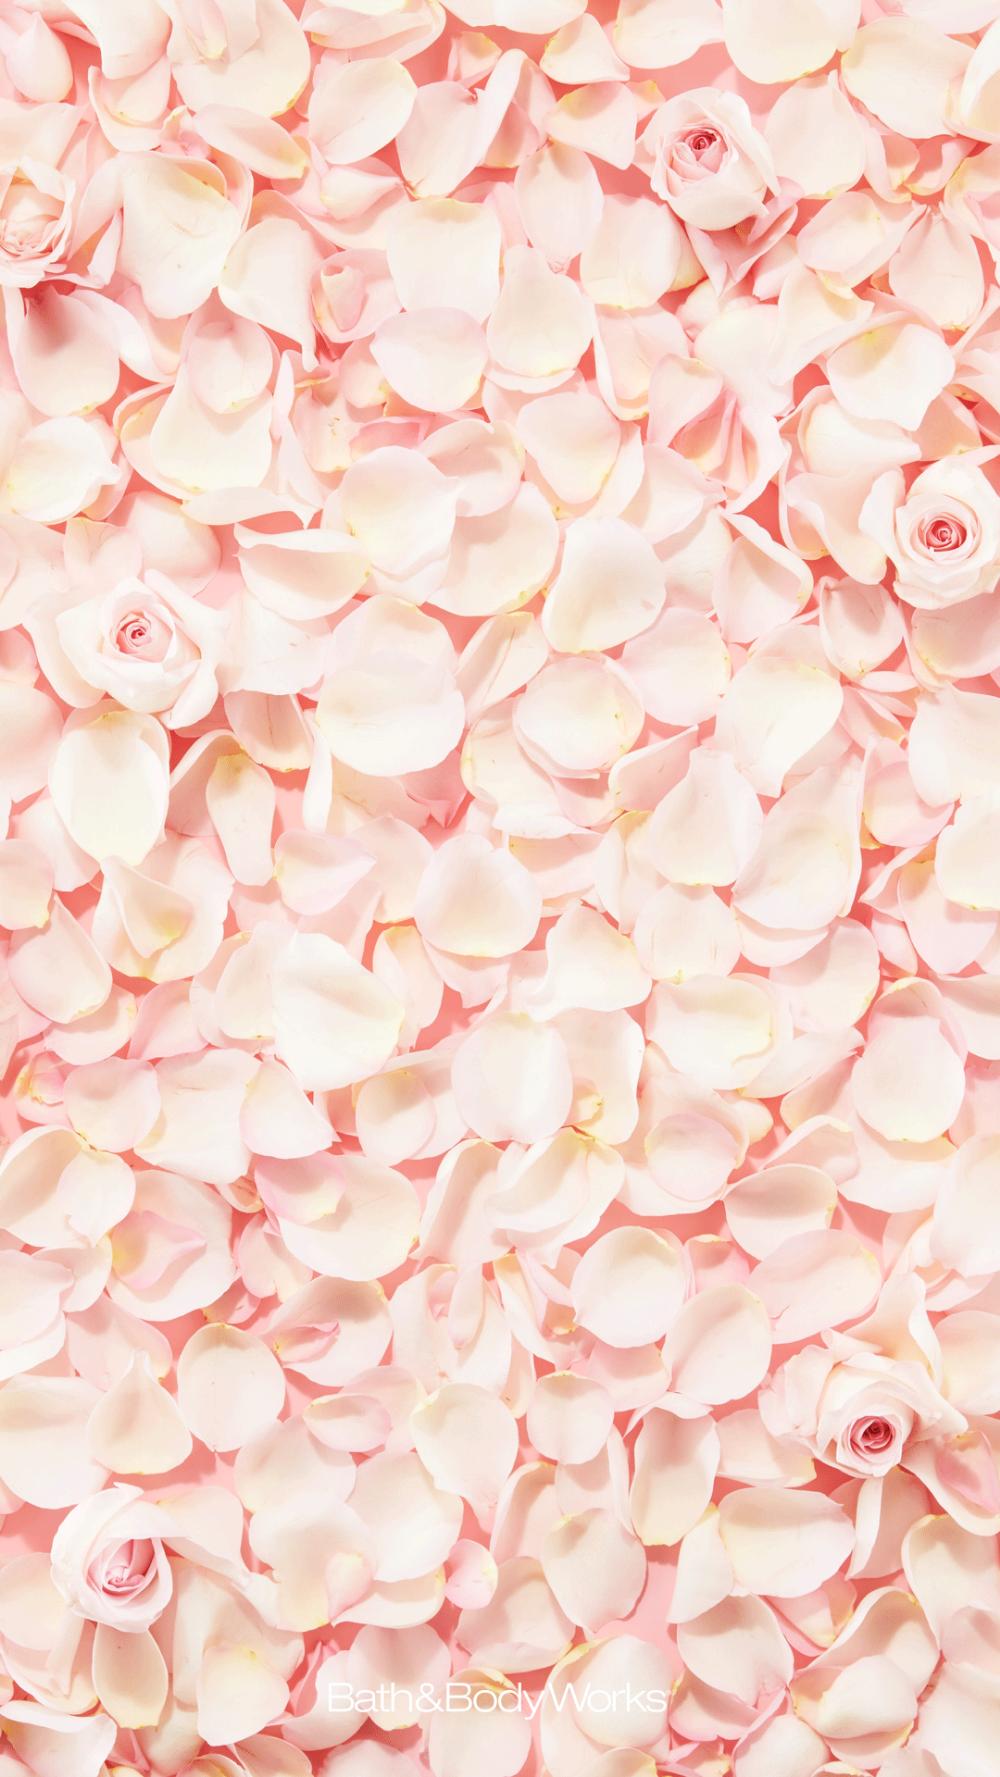 Rose Petals Iphone Wallpaper Background Teal Wallpaper Iphone Iphone Wallpaper Wallpaper Backgrounds